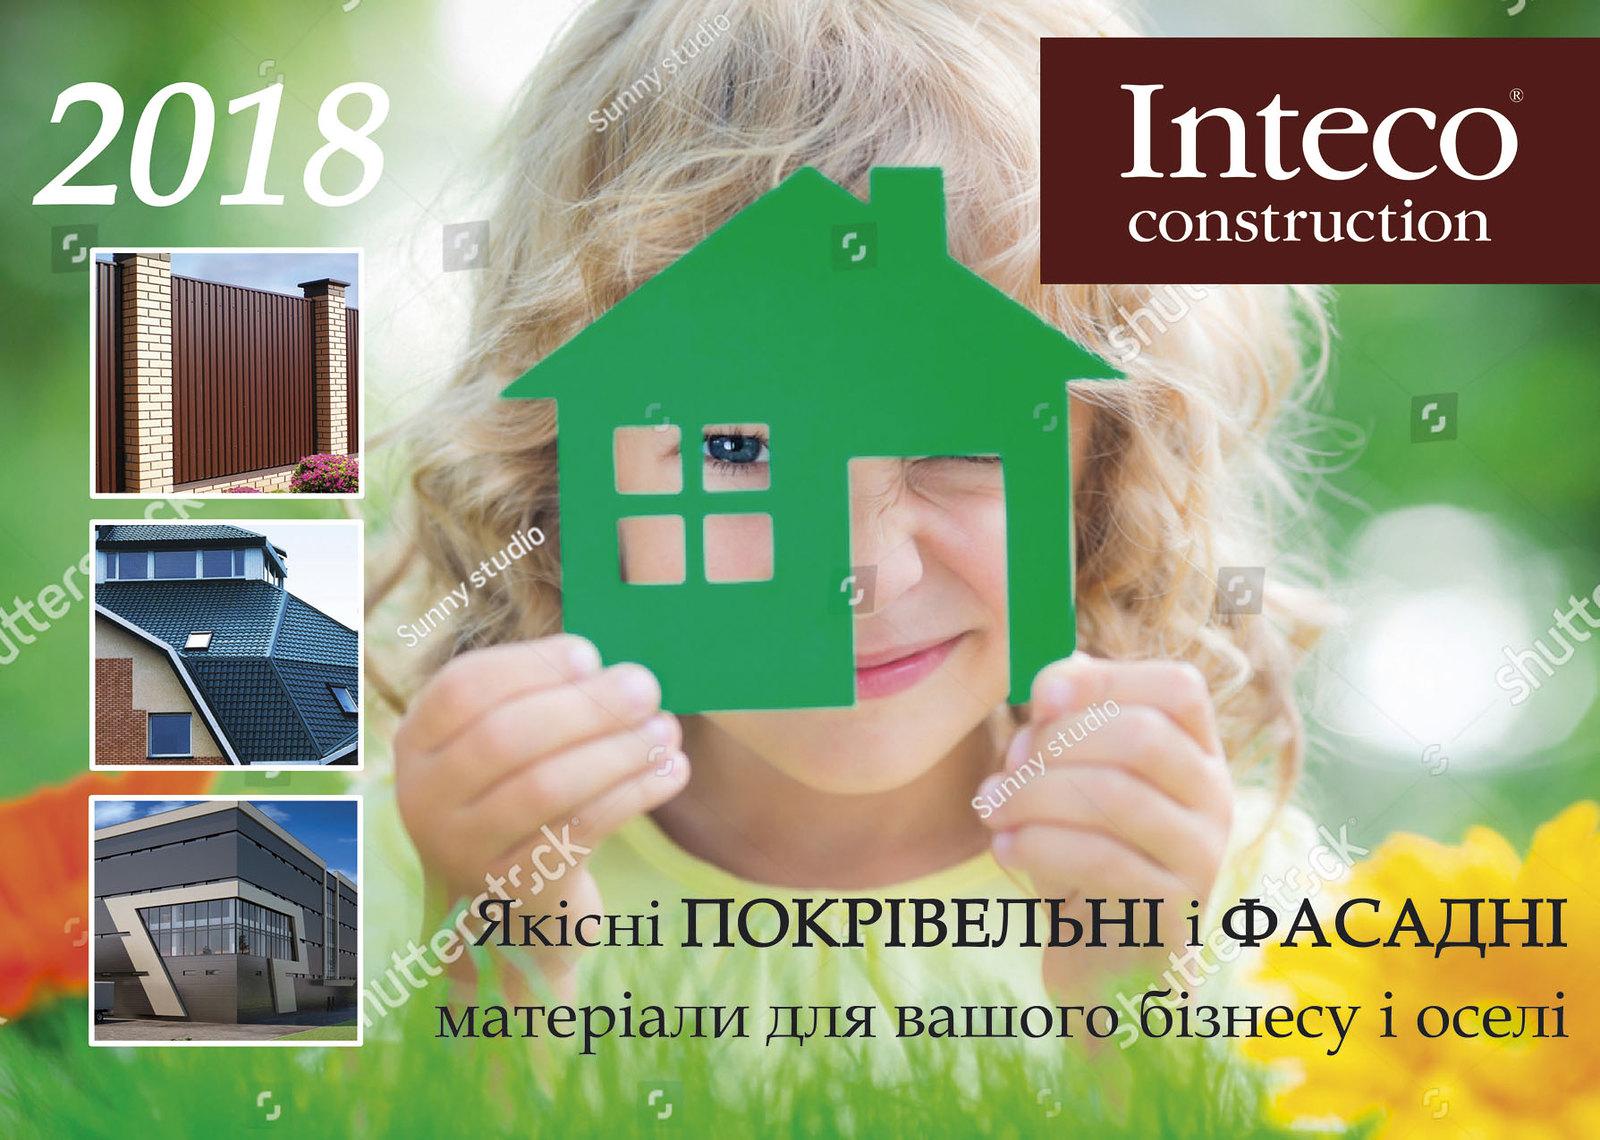 (01) Kalend Inteco 01 verh 05